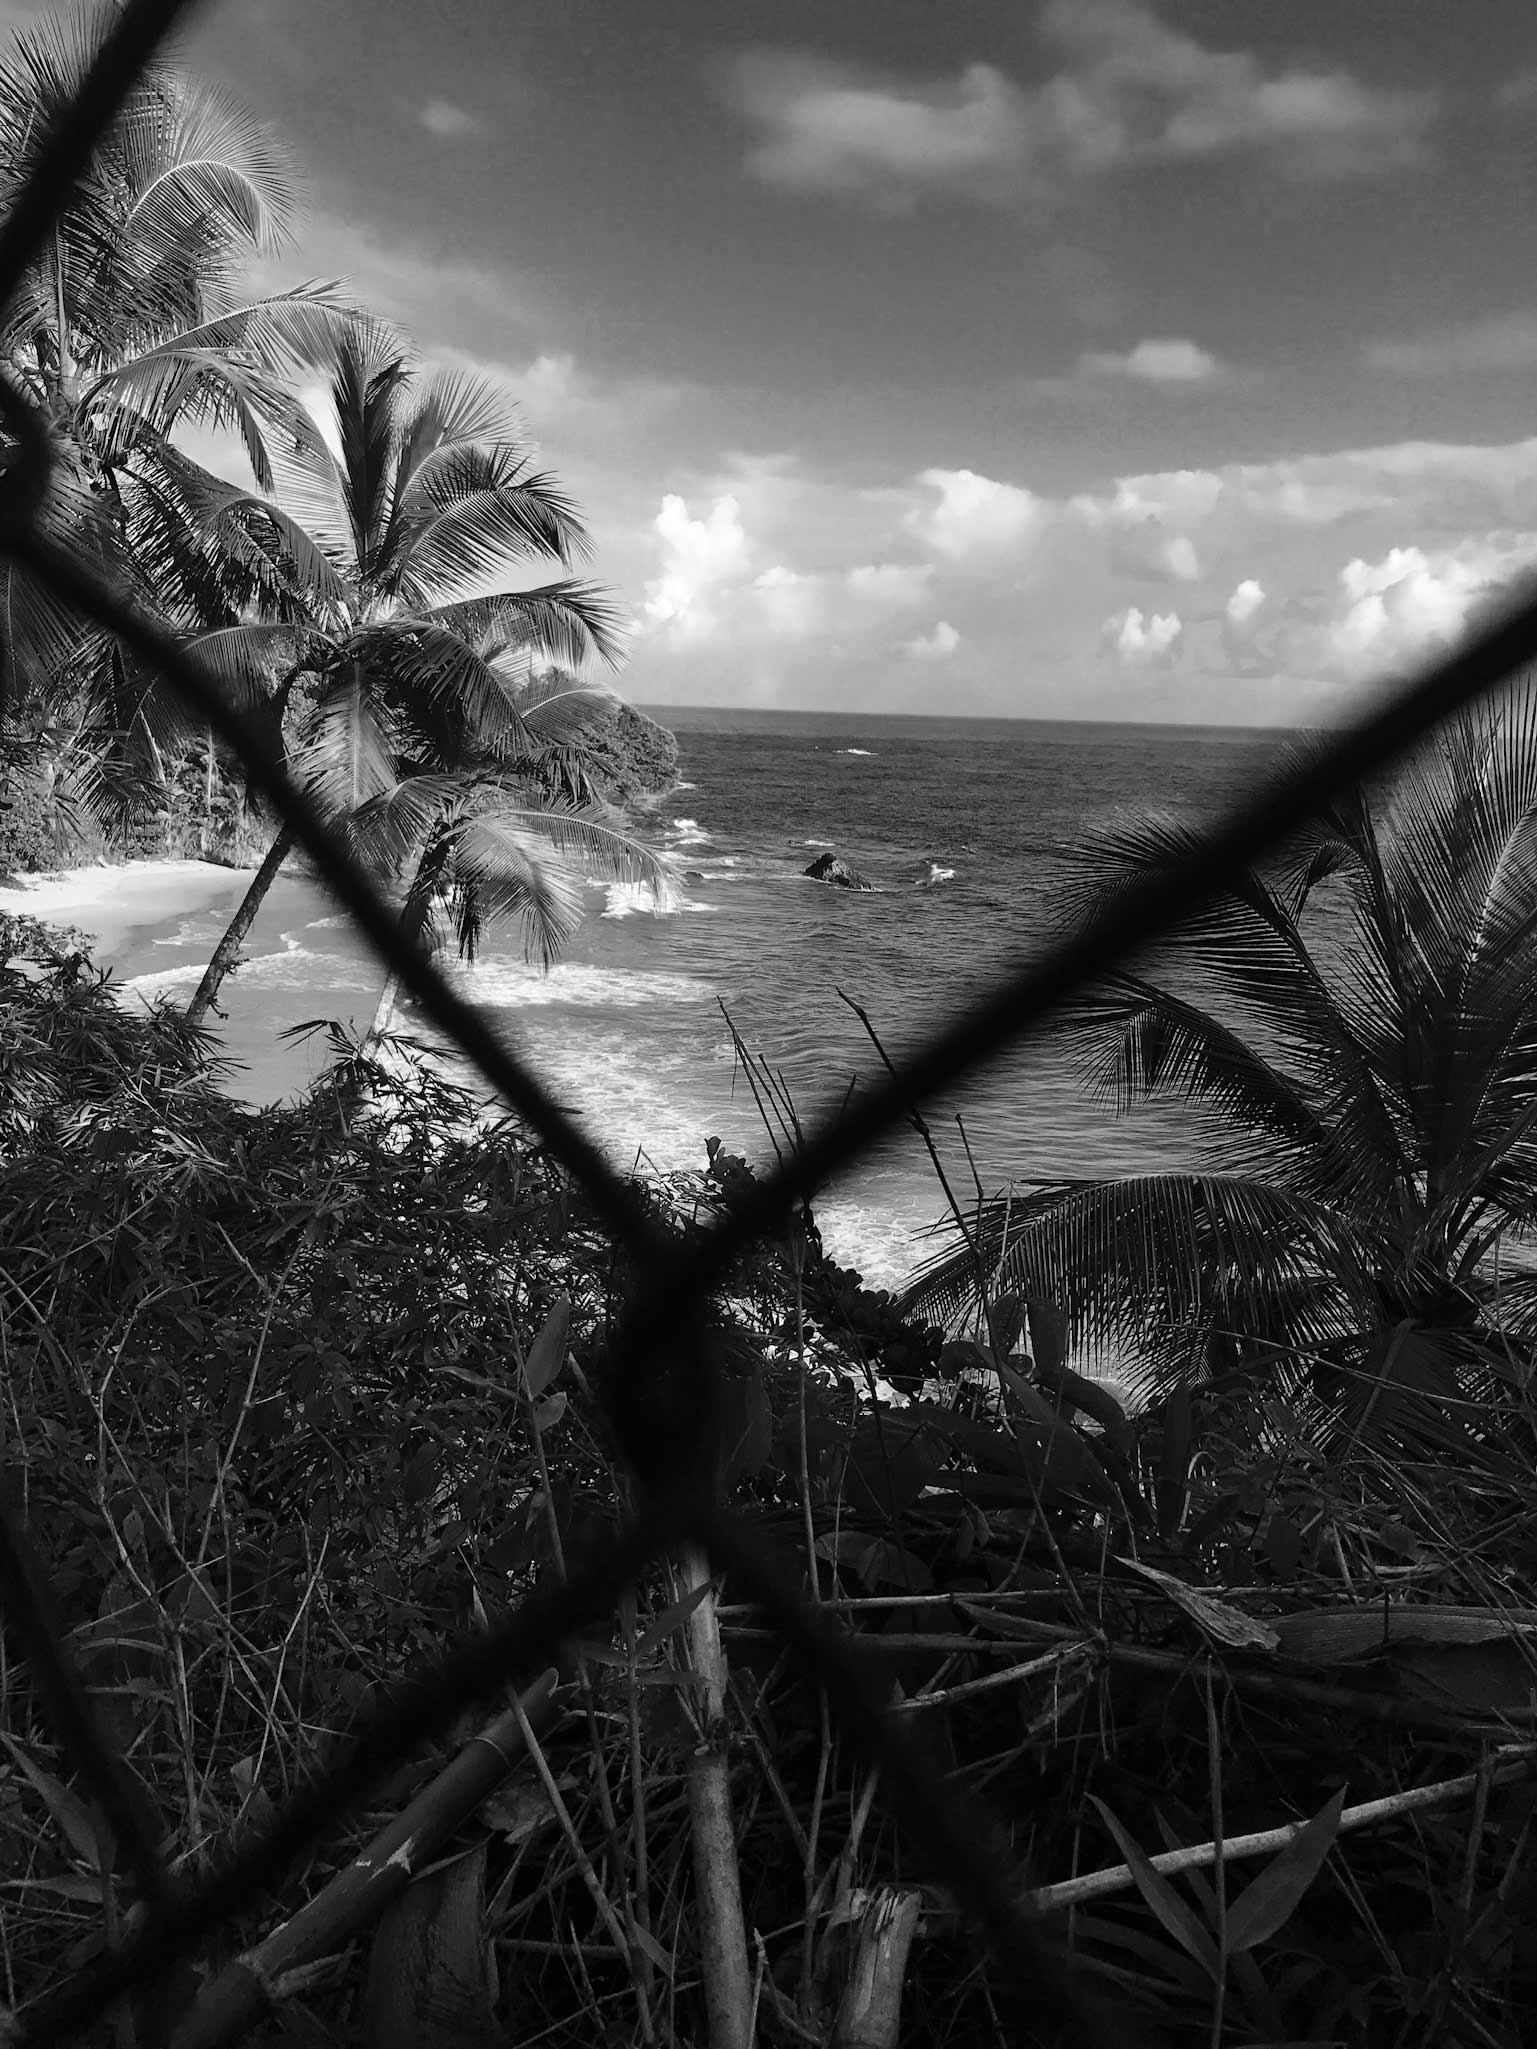 Chris Ofili: Caged in Paradise | by Joshua Jelly-Schapiro